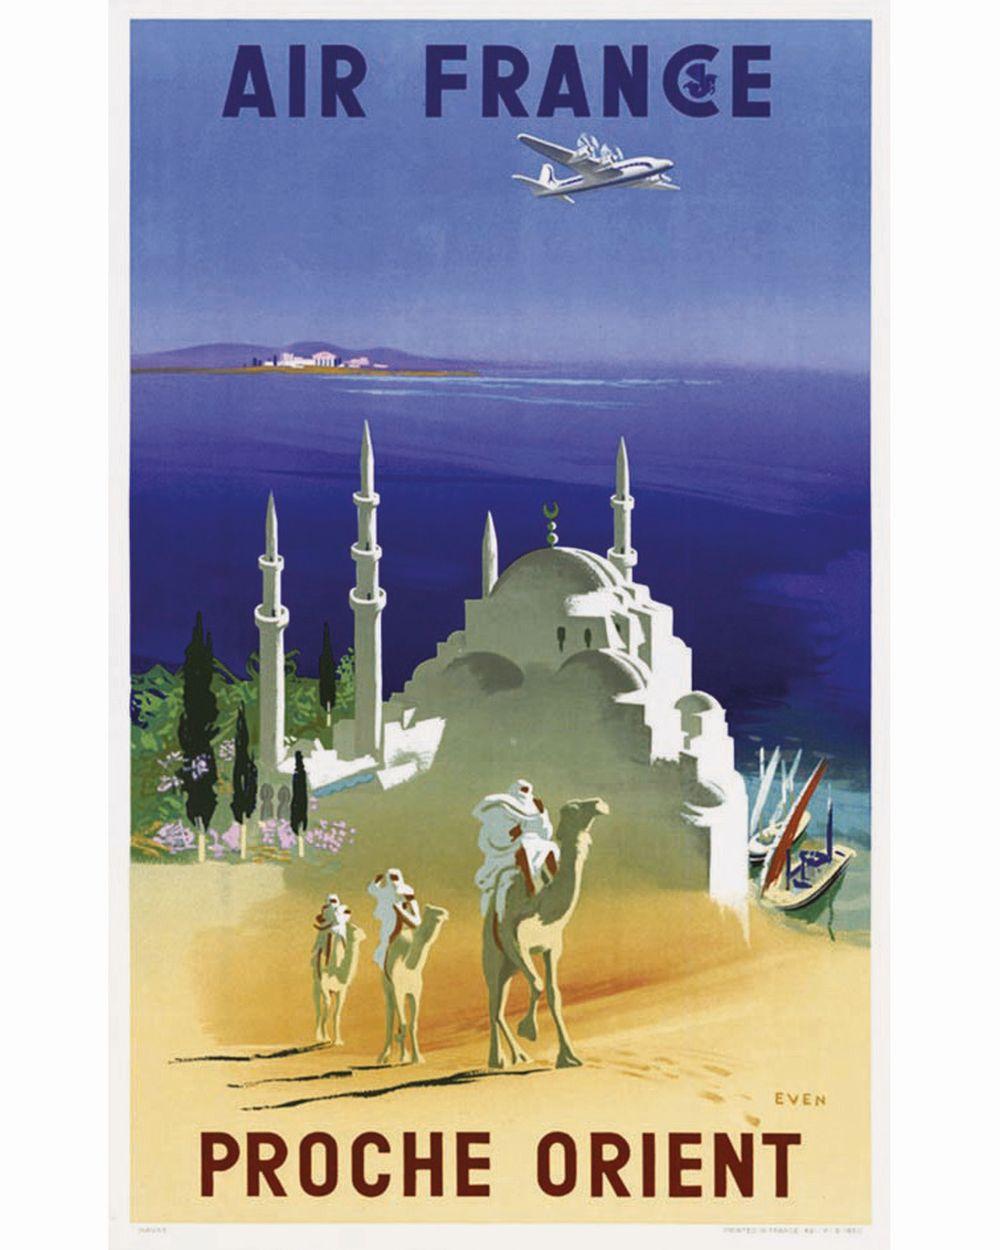 EVEN - Air France Proche Orient     1950